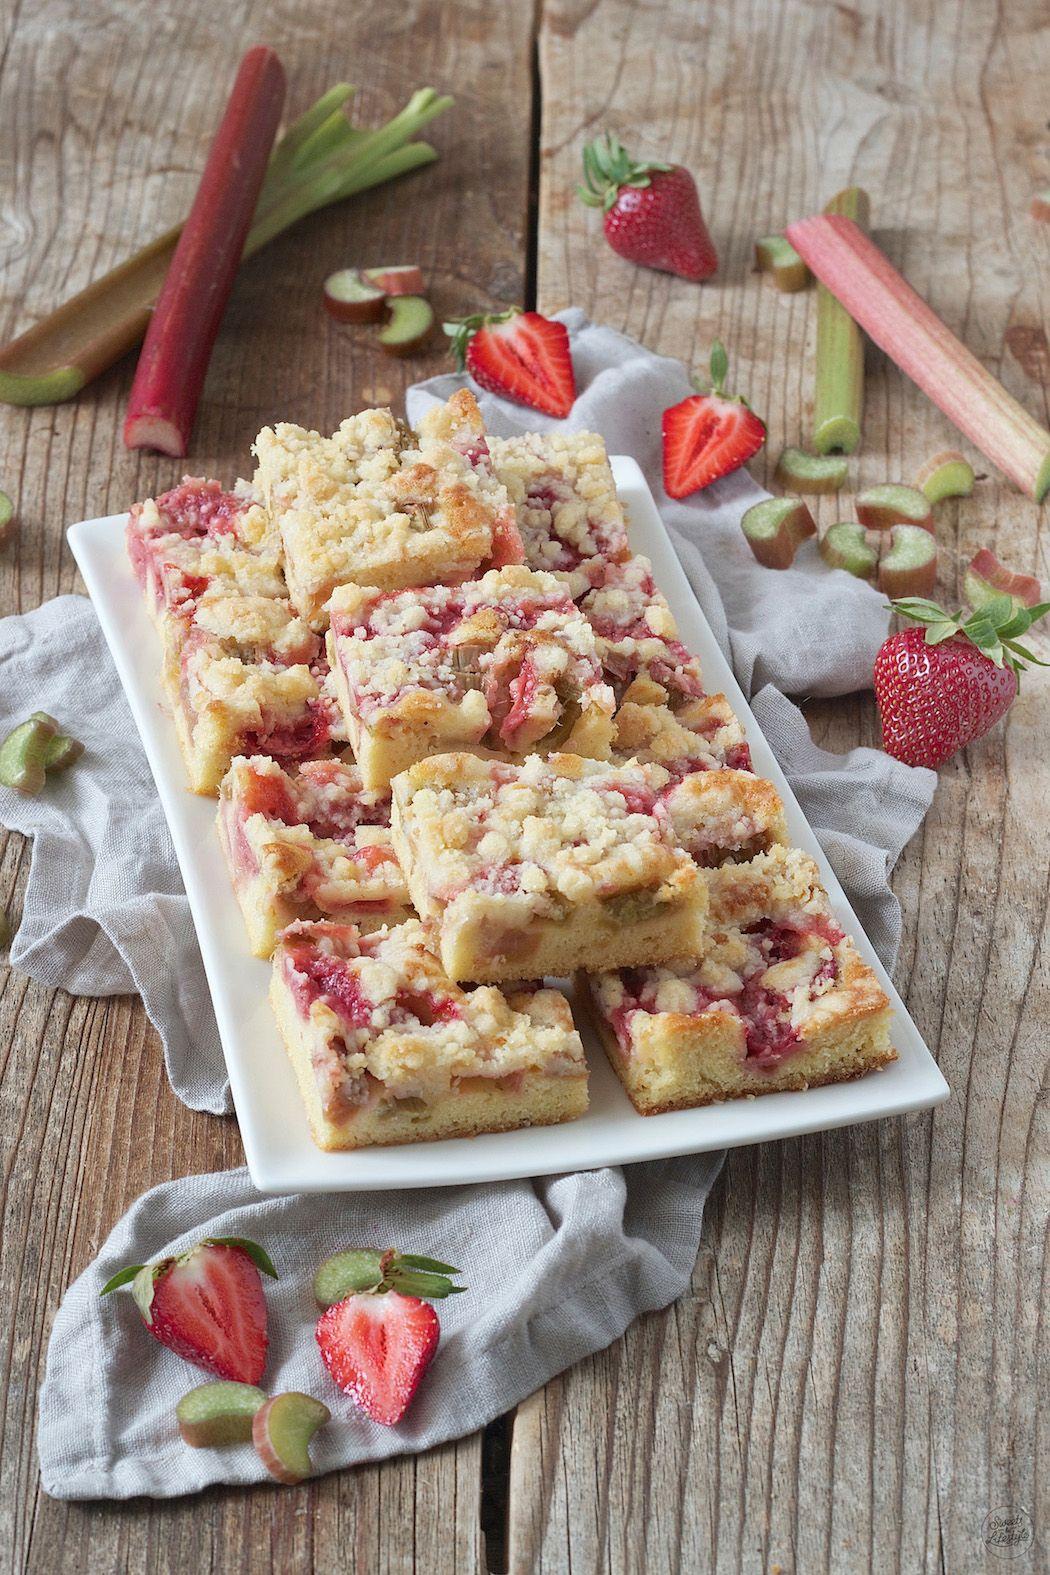 Erdbeer Rhabarber Kuchen Rezept Kuchen Pinterest Erdbeer